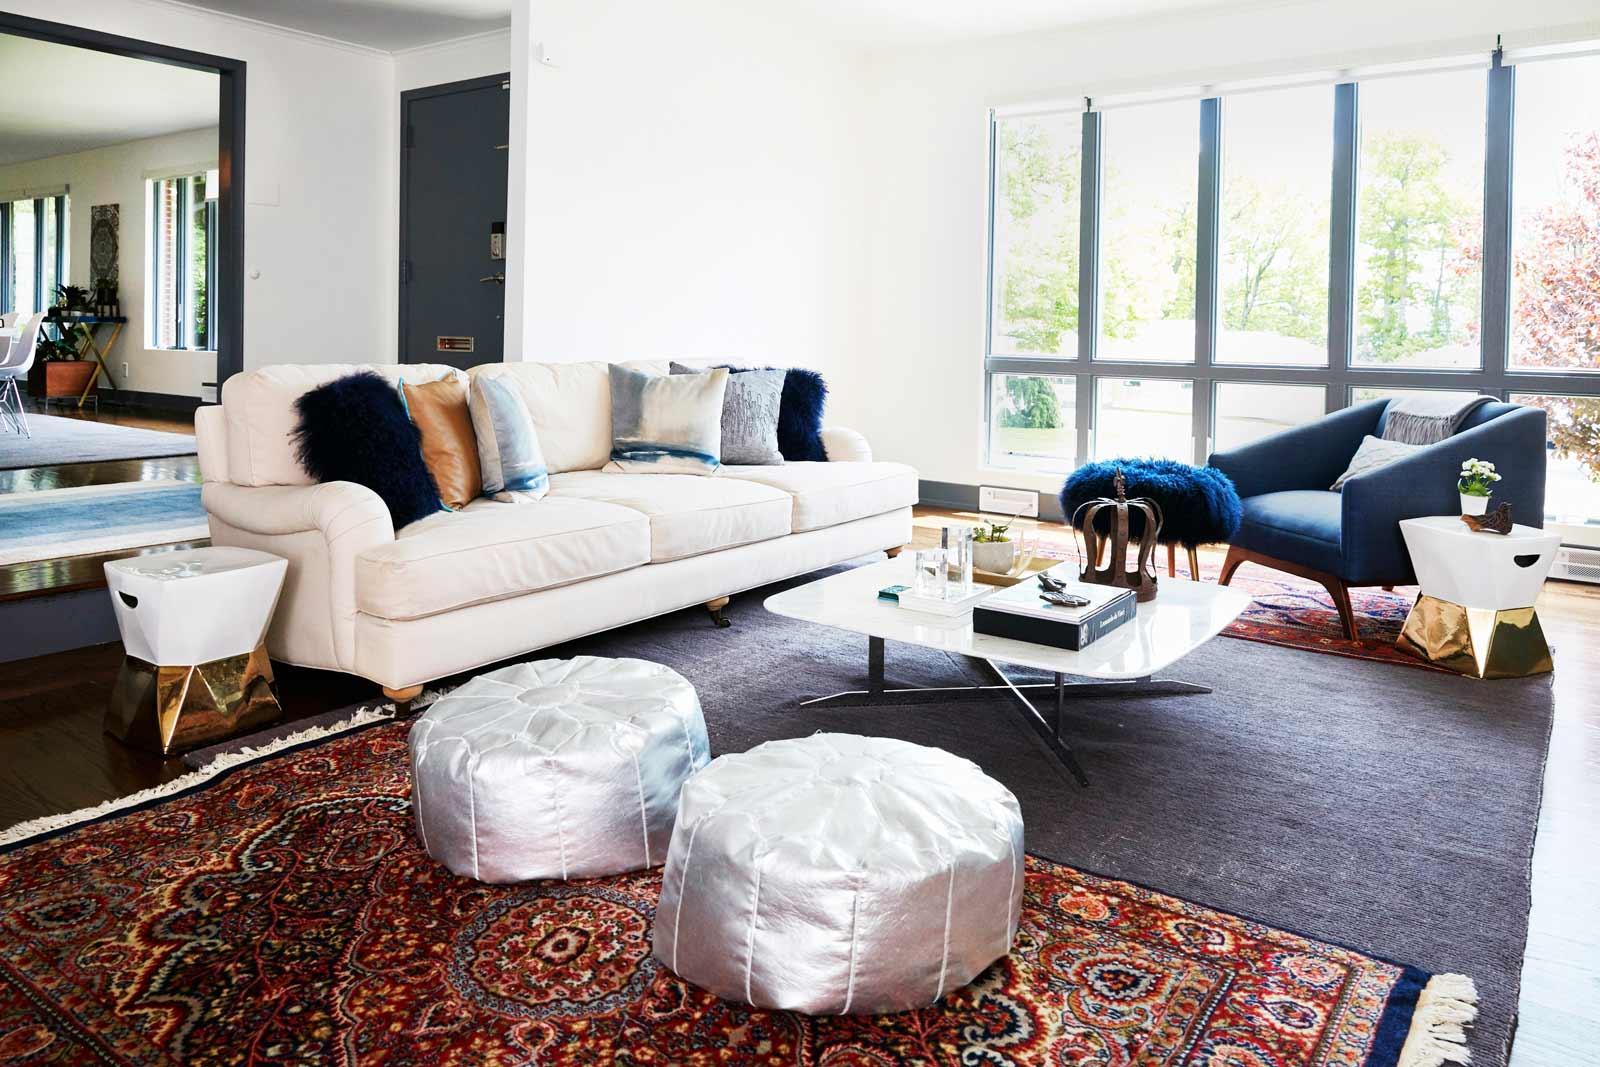 Sunken living room in Nureed Saeed's mid-century modern home in South Orange, NJ